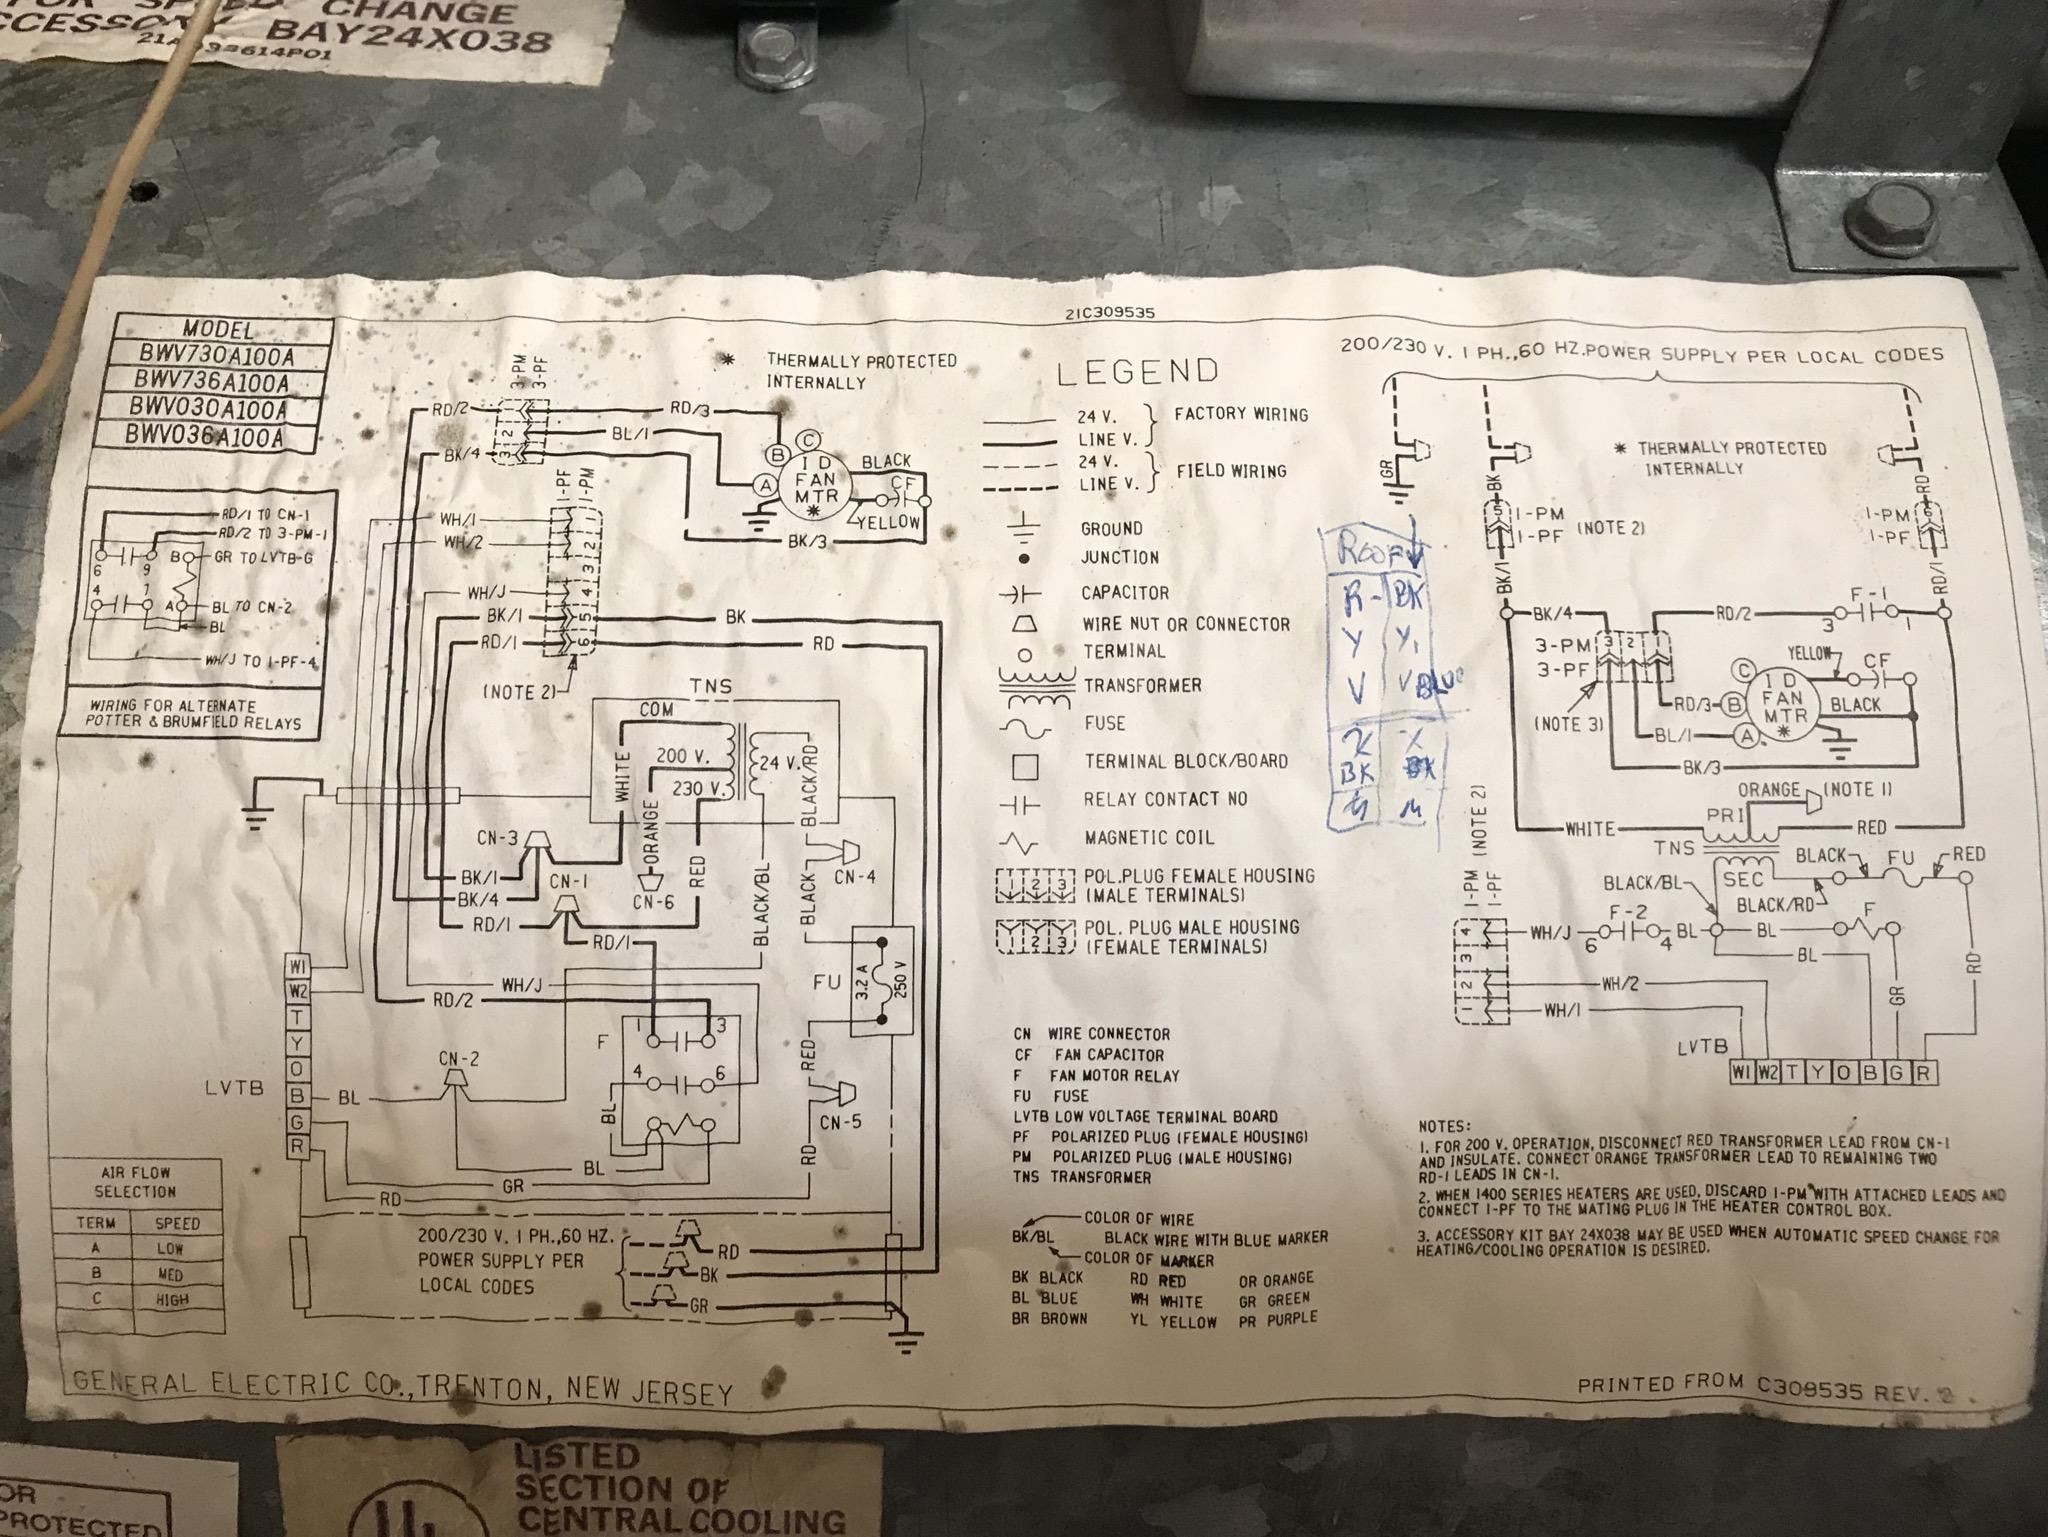 Rane Heil Furnace Thermostat Wiring Diagram Amana On Robertshaw